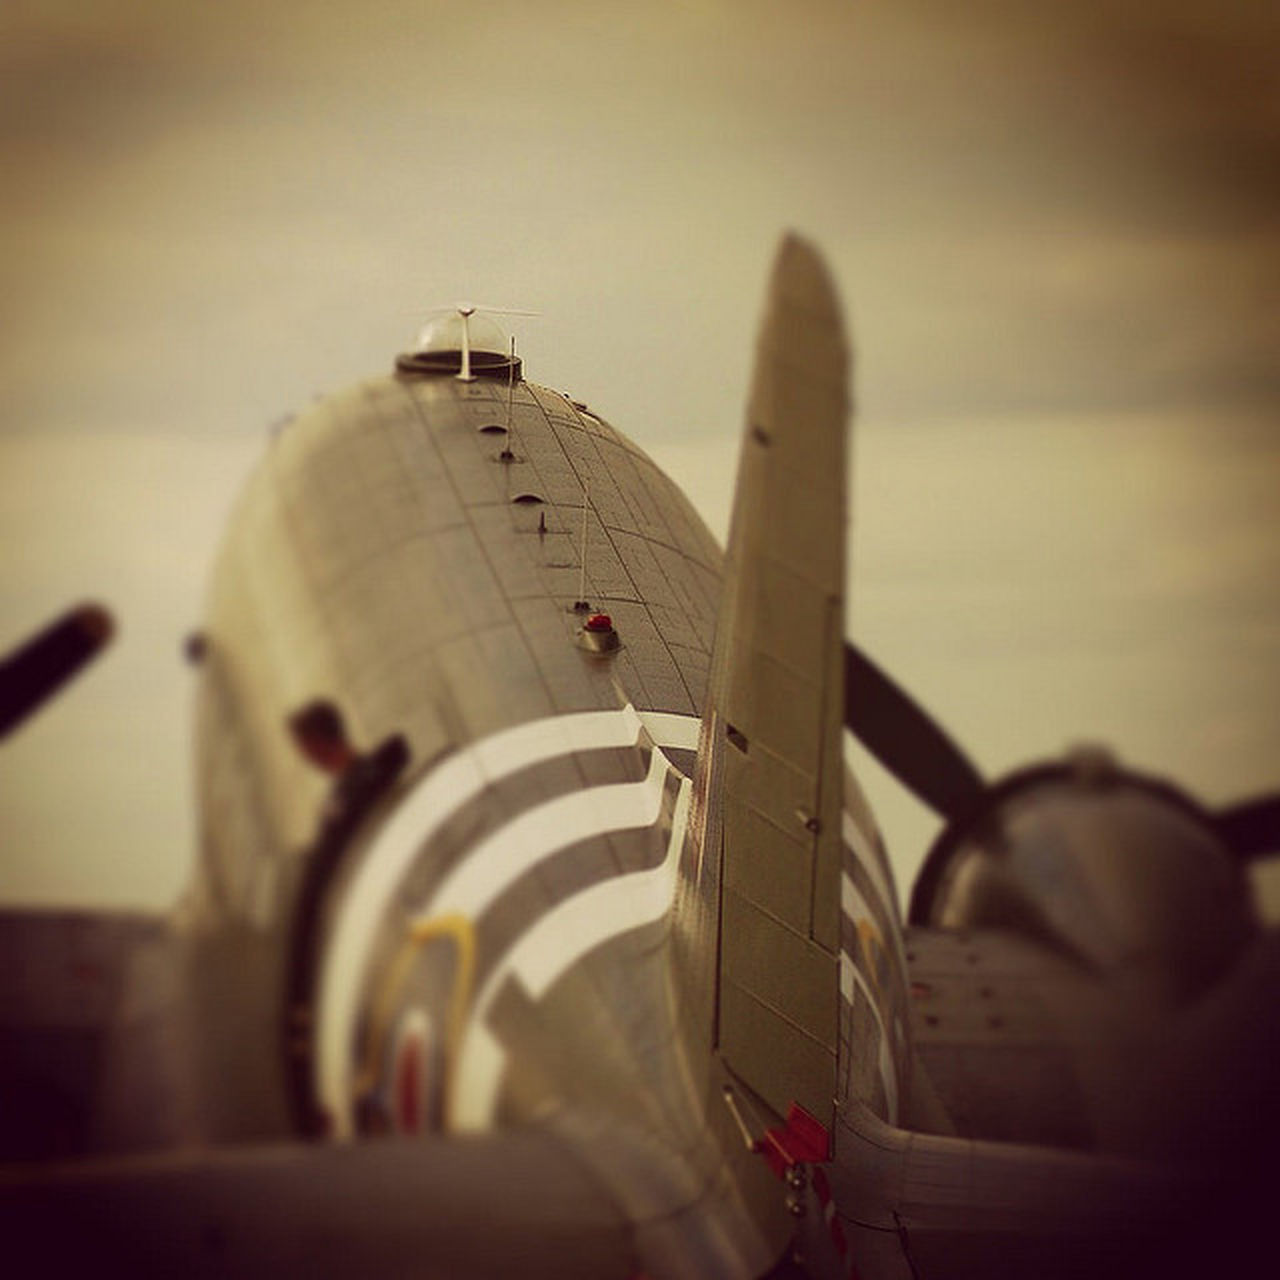 Airplane Aircraft Wing Transportation Battle Of Britain Flight DC3 Dakota  Ww2 Plane Southend On Sea